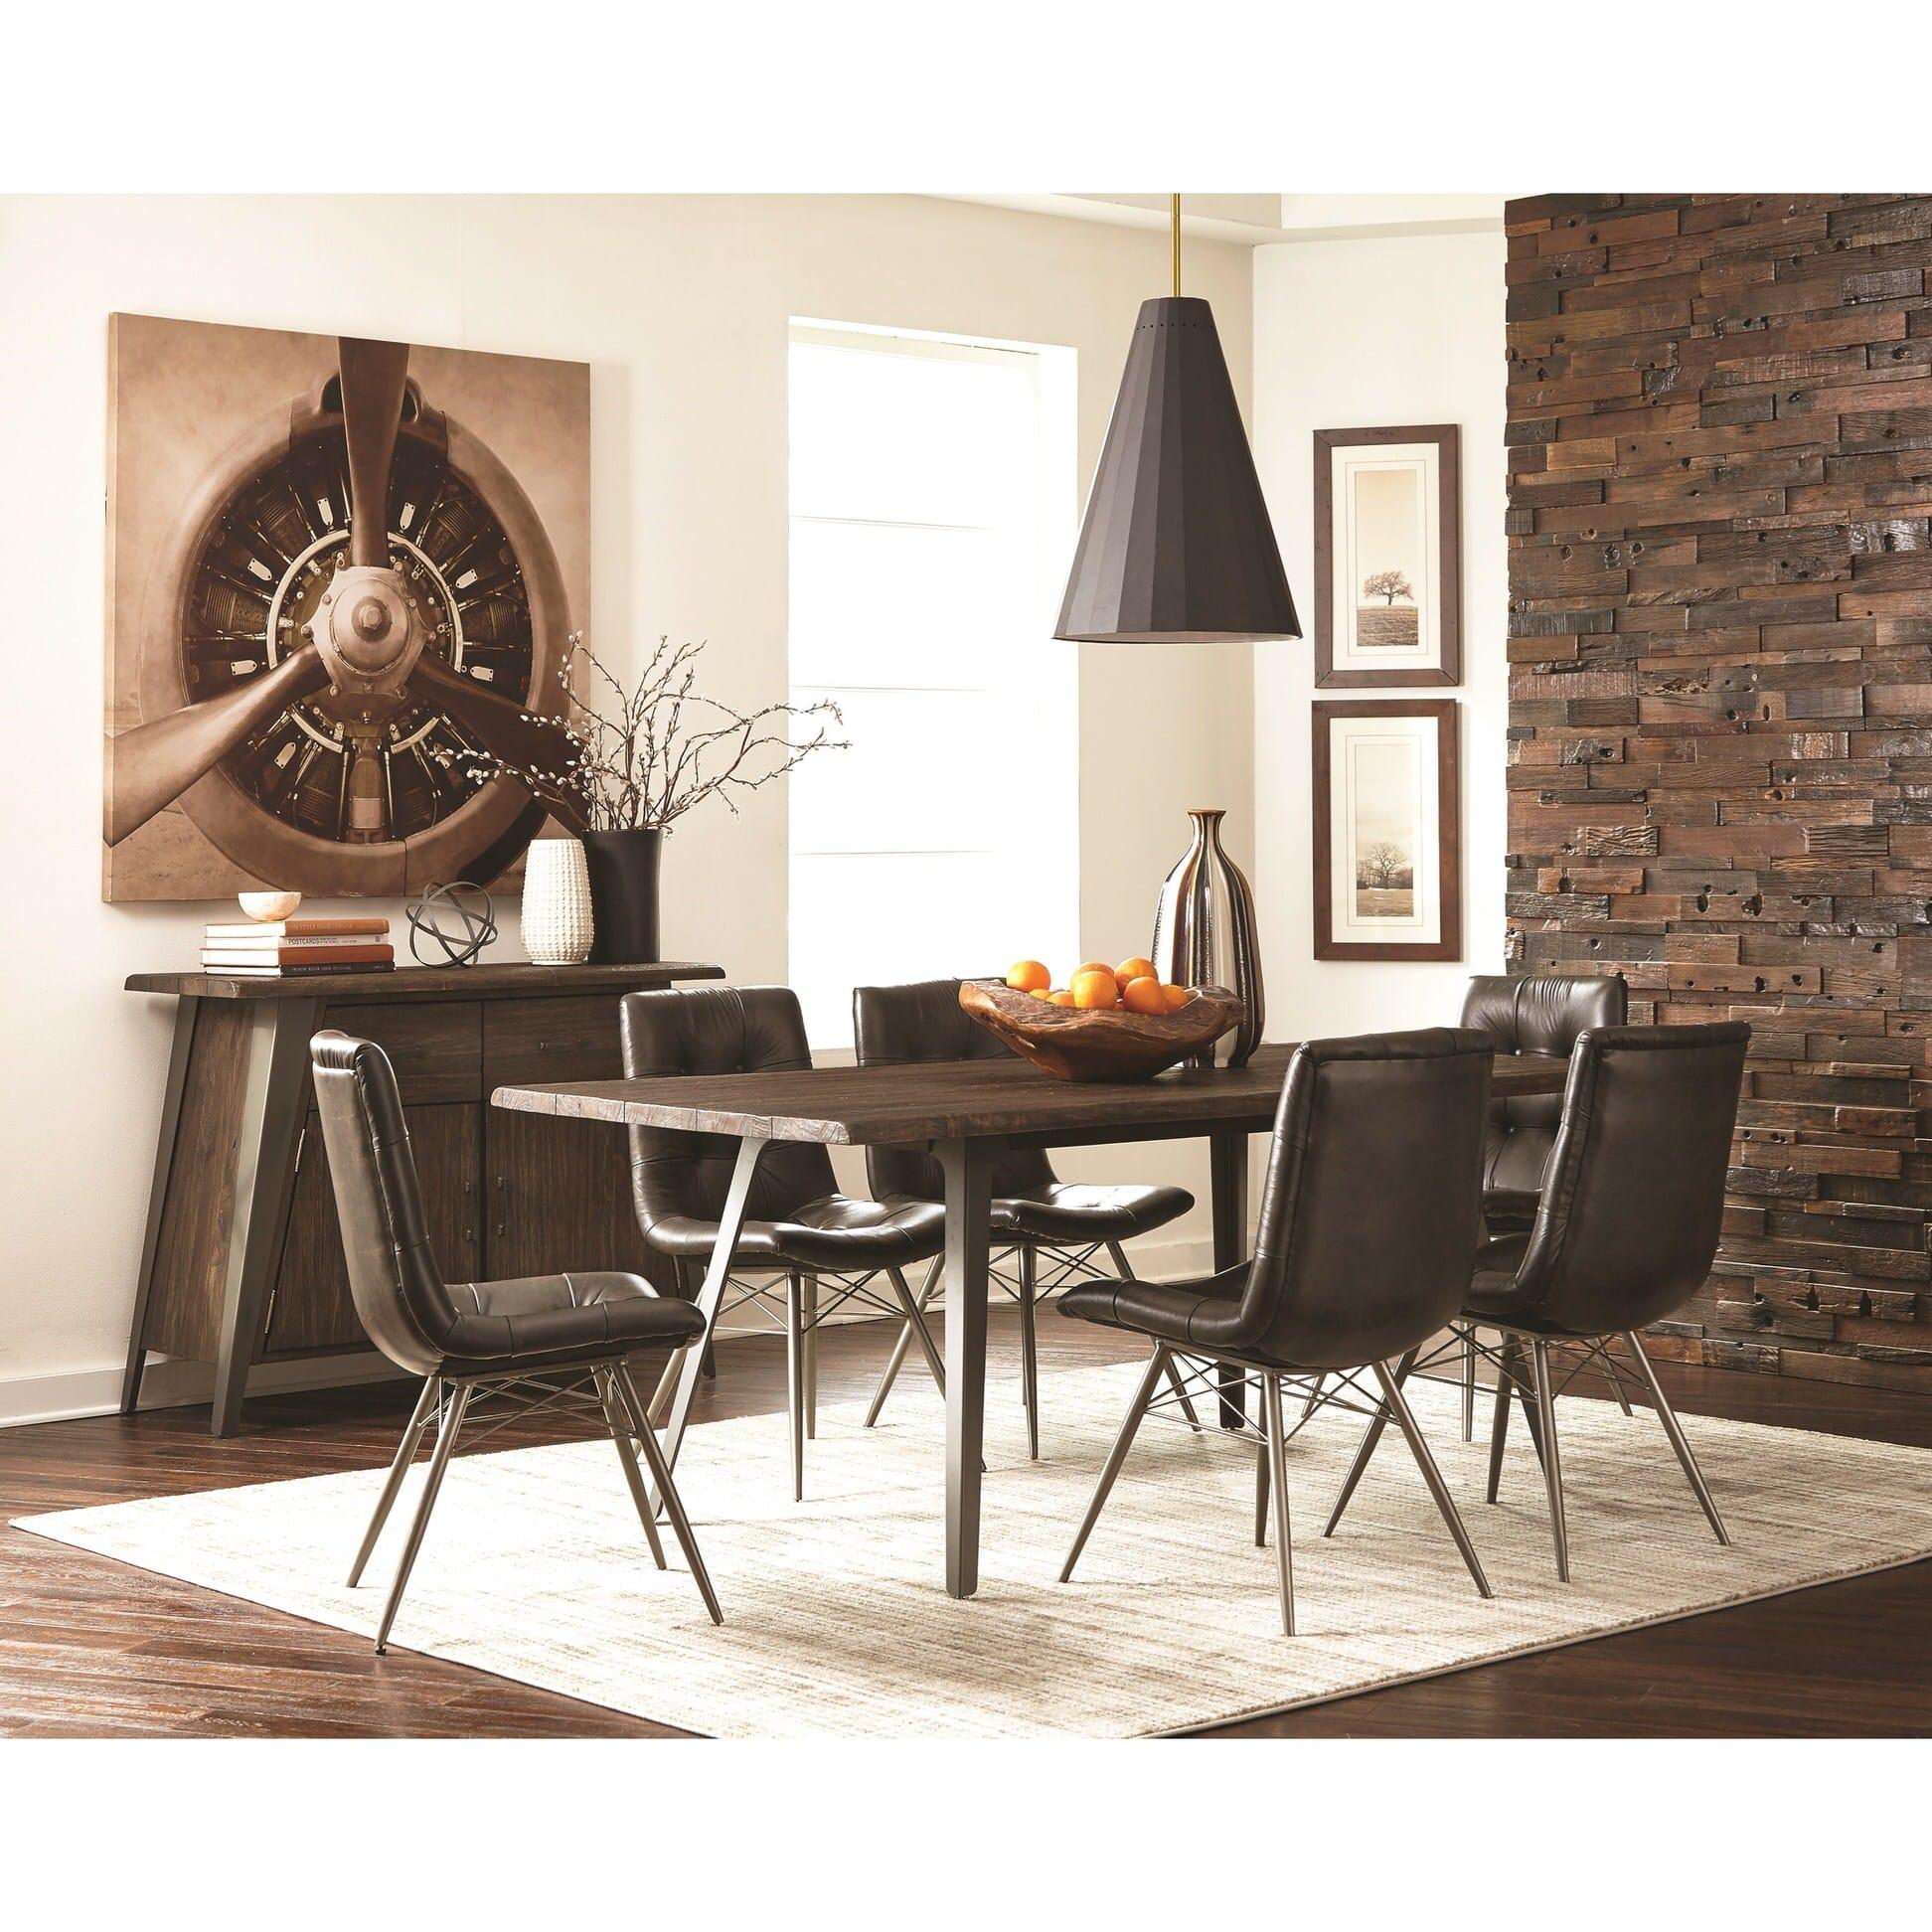 107861 Dark Rustic Brown Dining Table By Scott Living